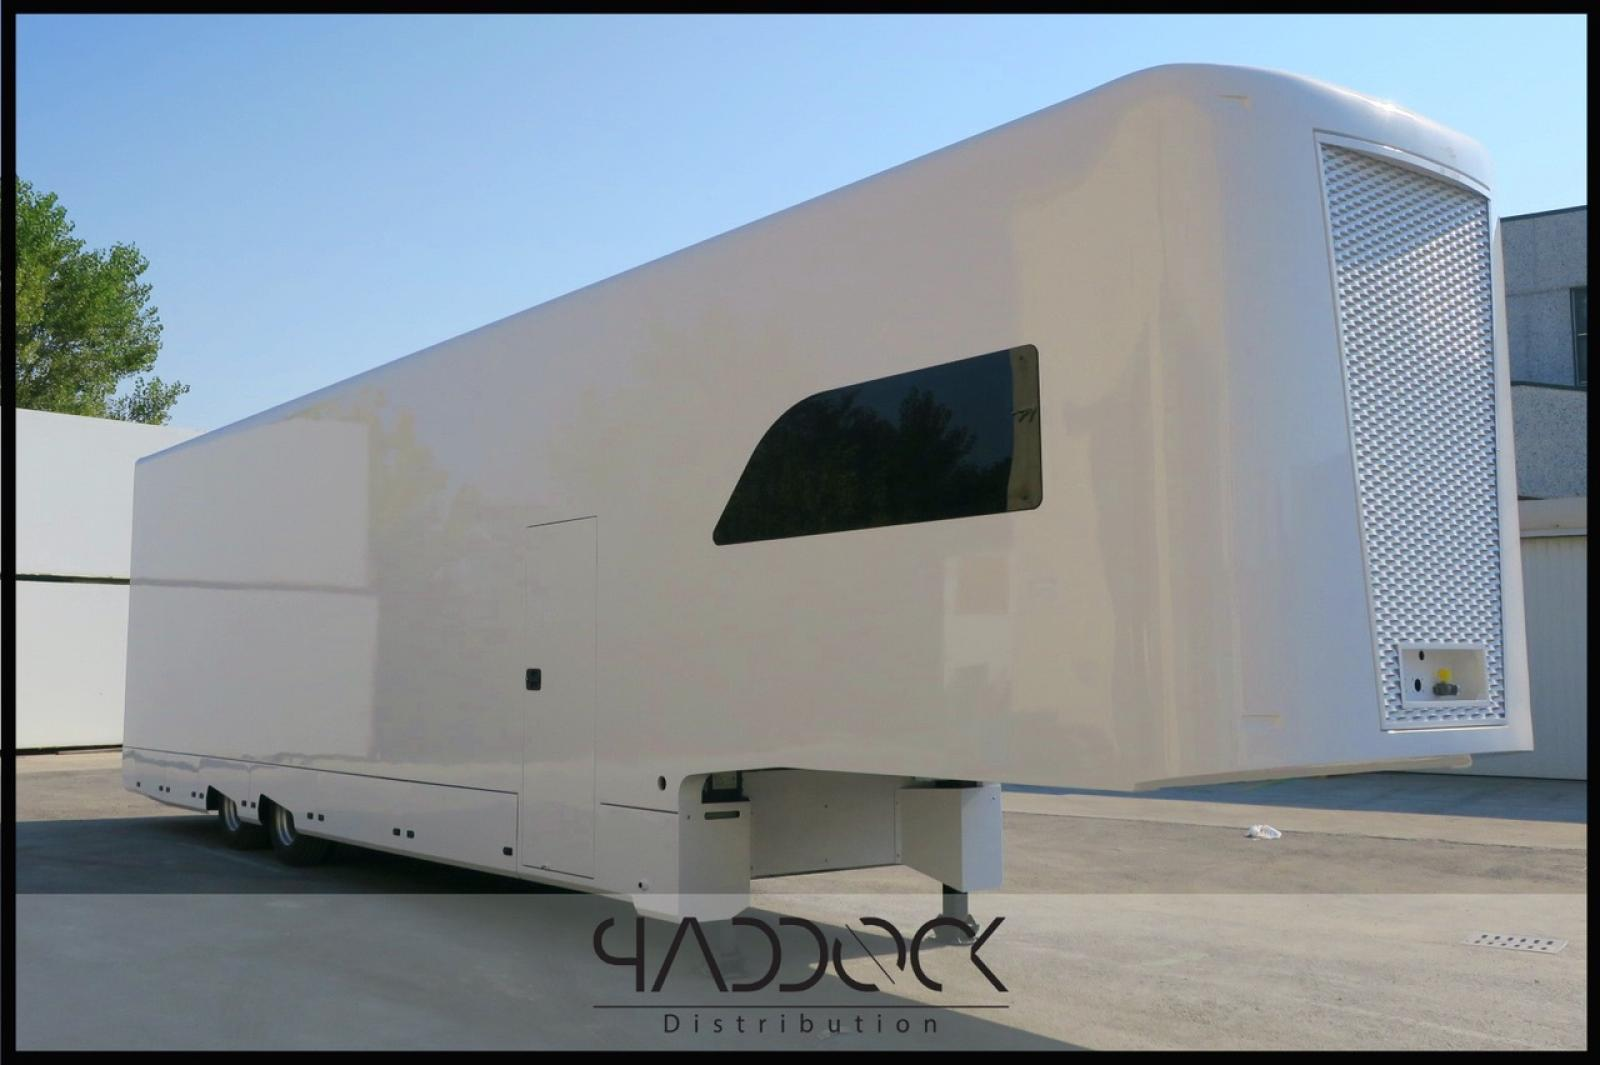 Z2 4728 ASTA CAR BY PADDOCK DISTRIBUTION - 1